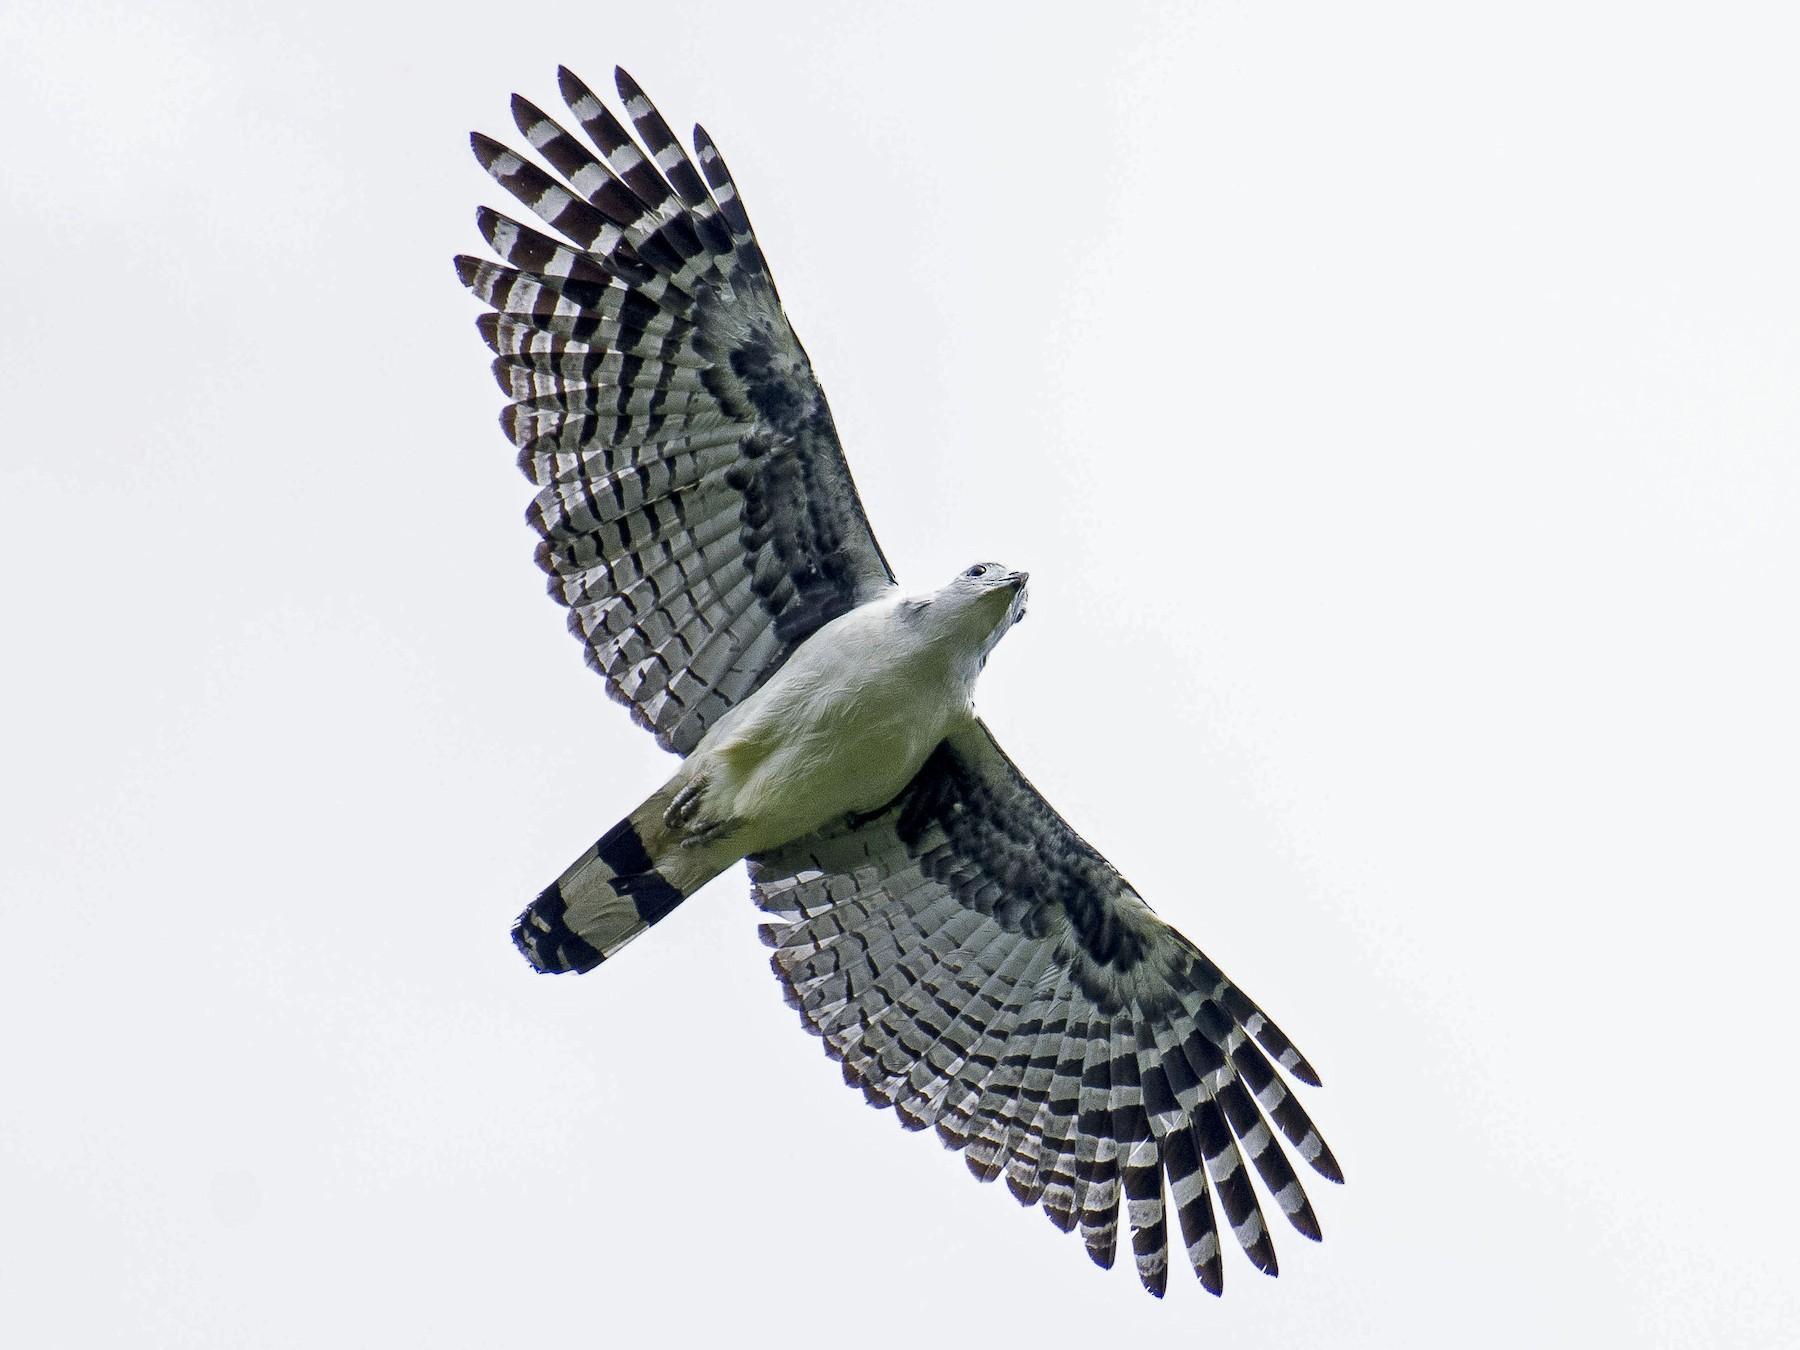 Gray-headed Kite - Cyril Coomansingh